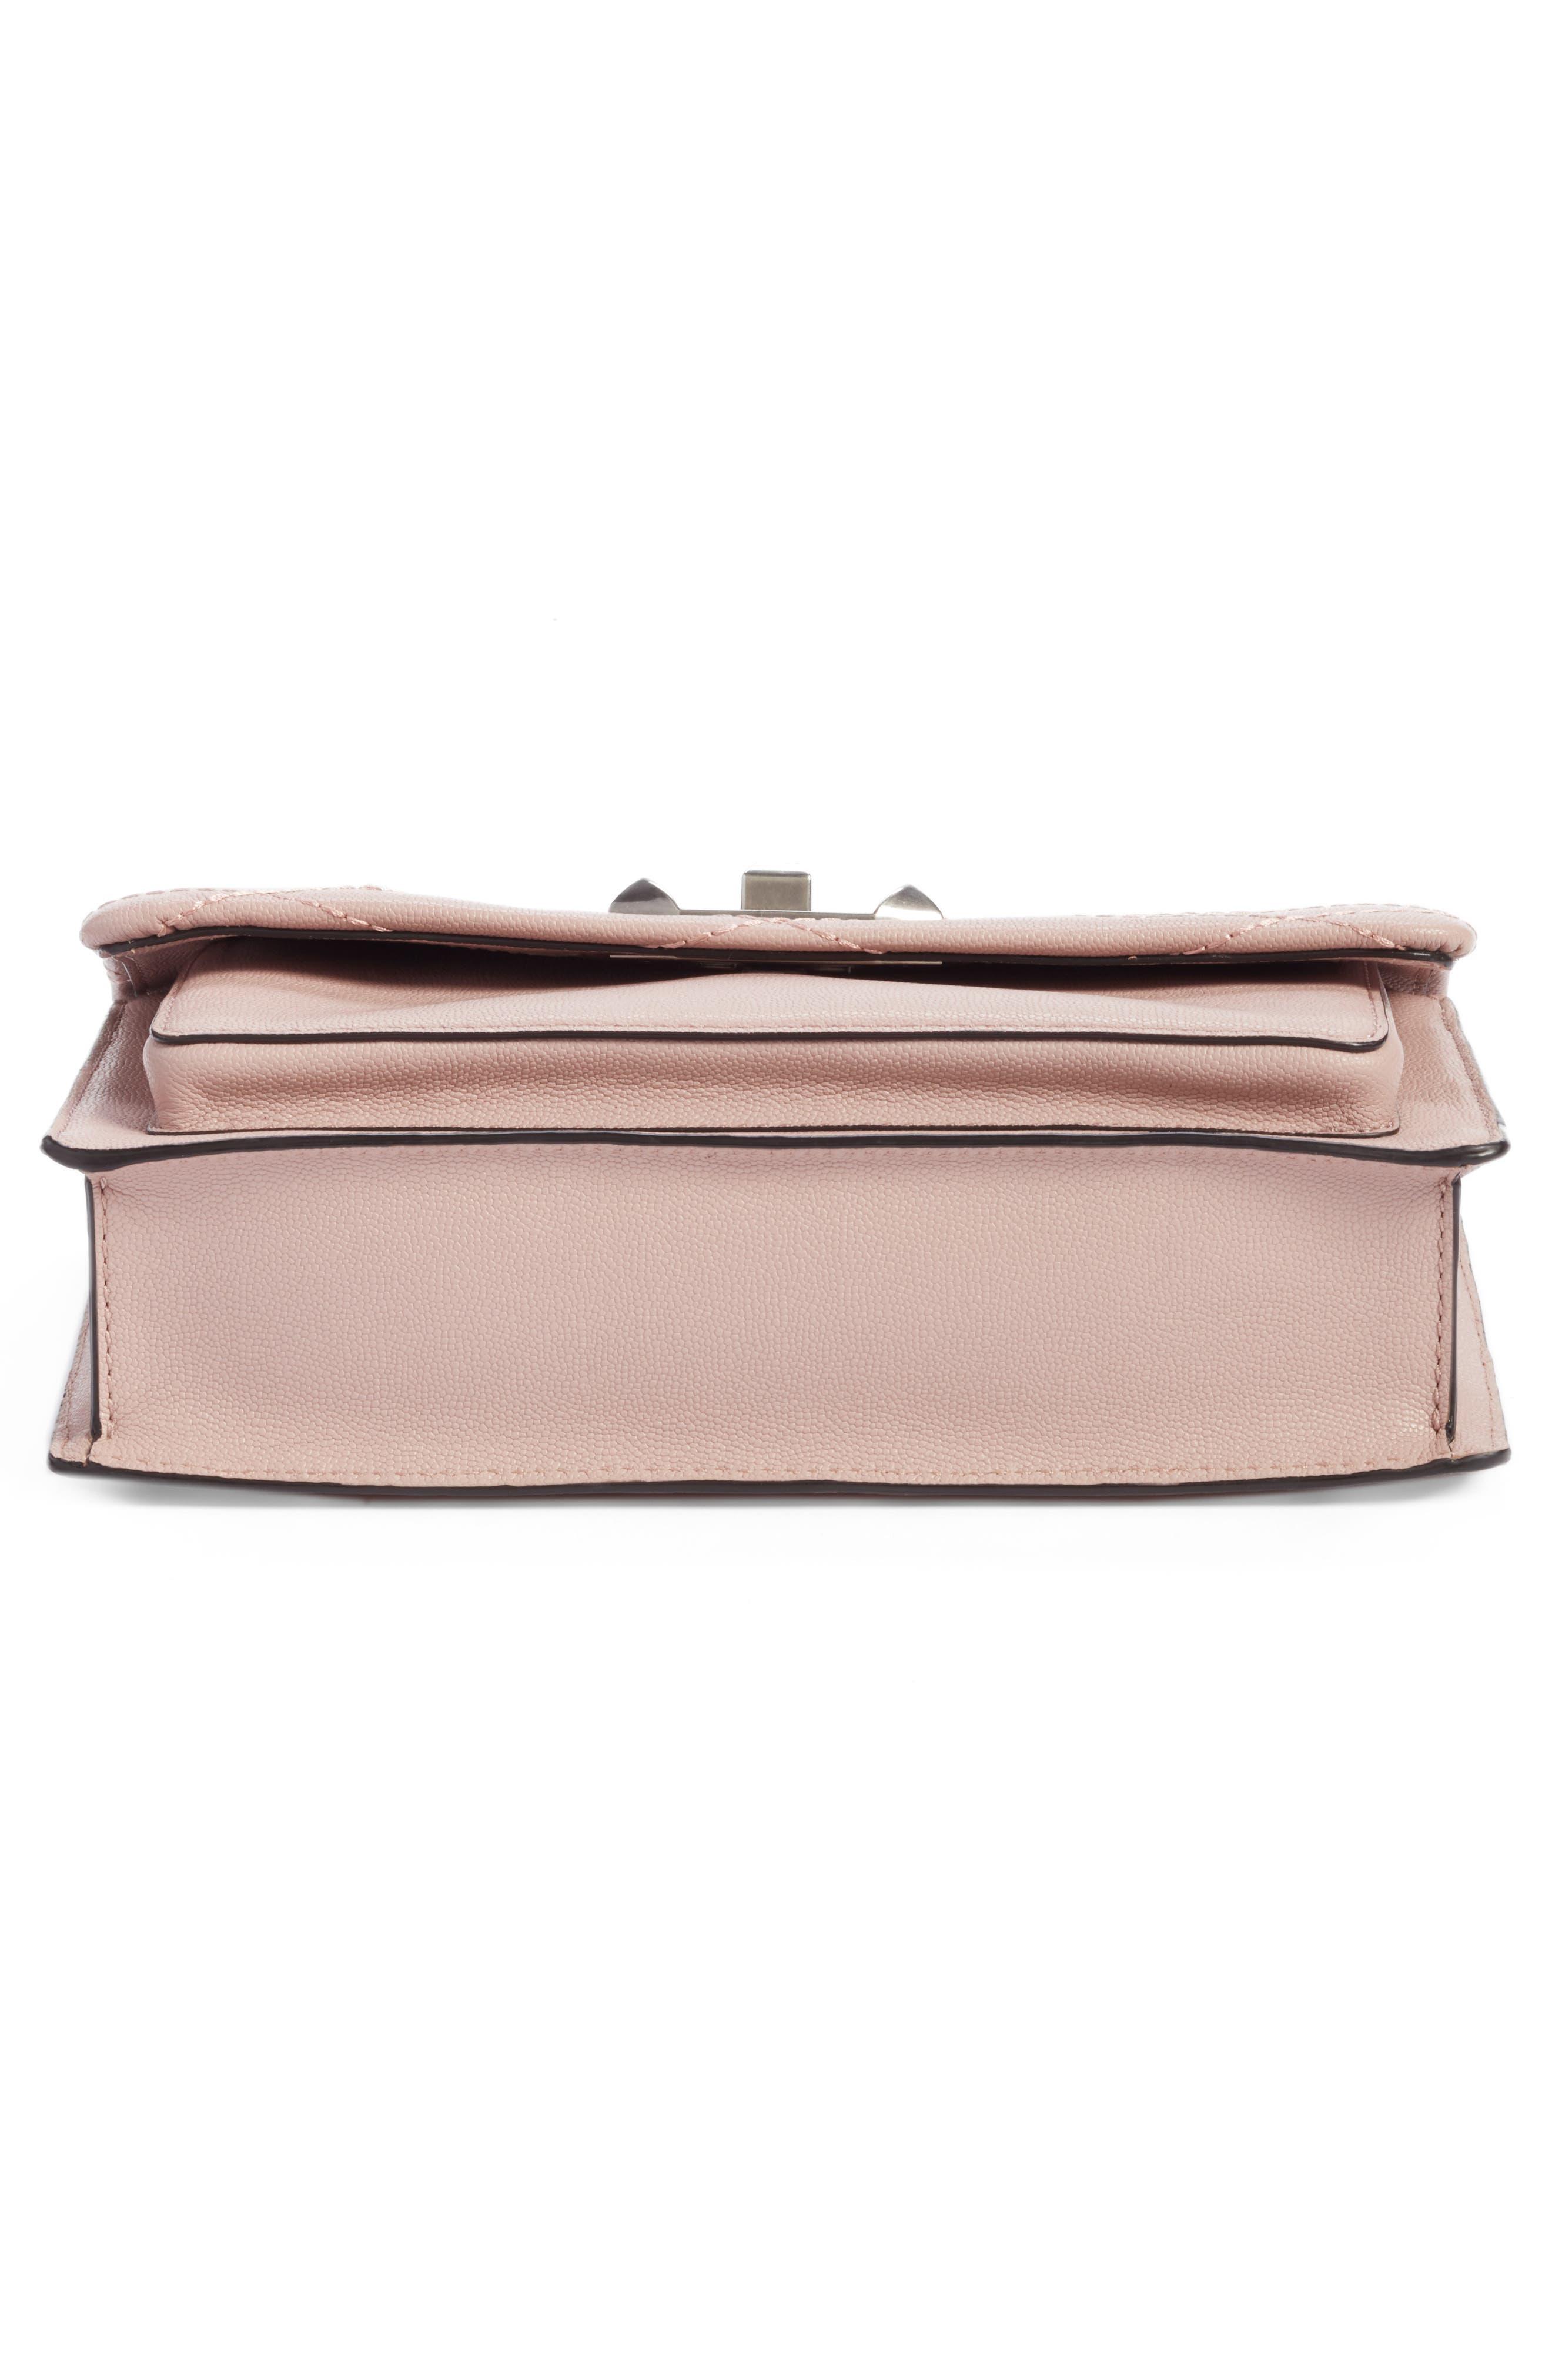 Medium Je T'aime Convertible Leather Crossbody Bag,                             Alternate thumbnail 5, color,                             Vintage Pink